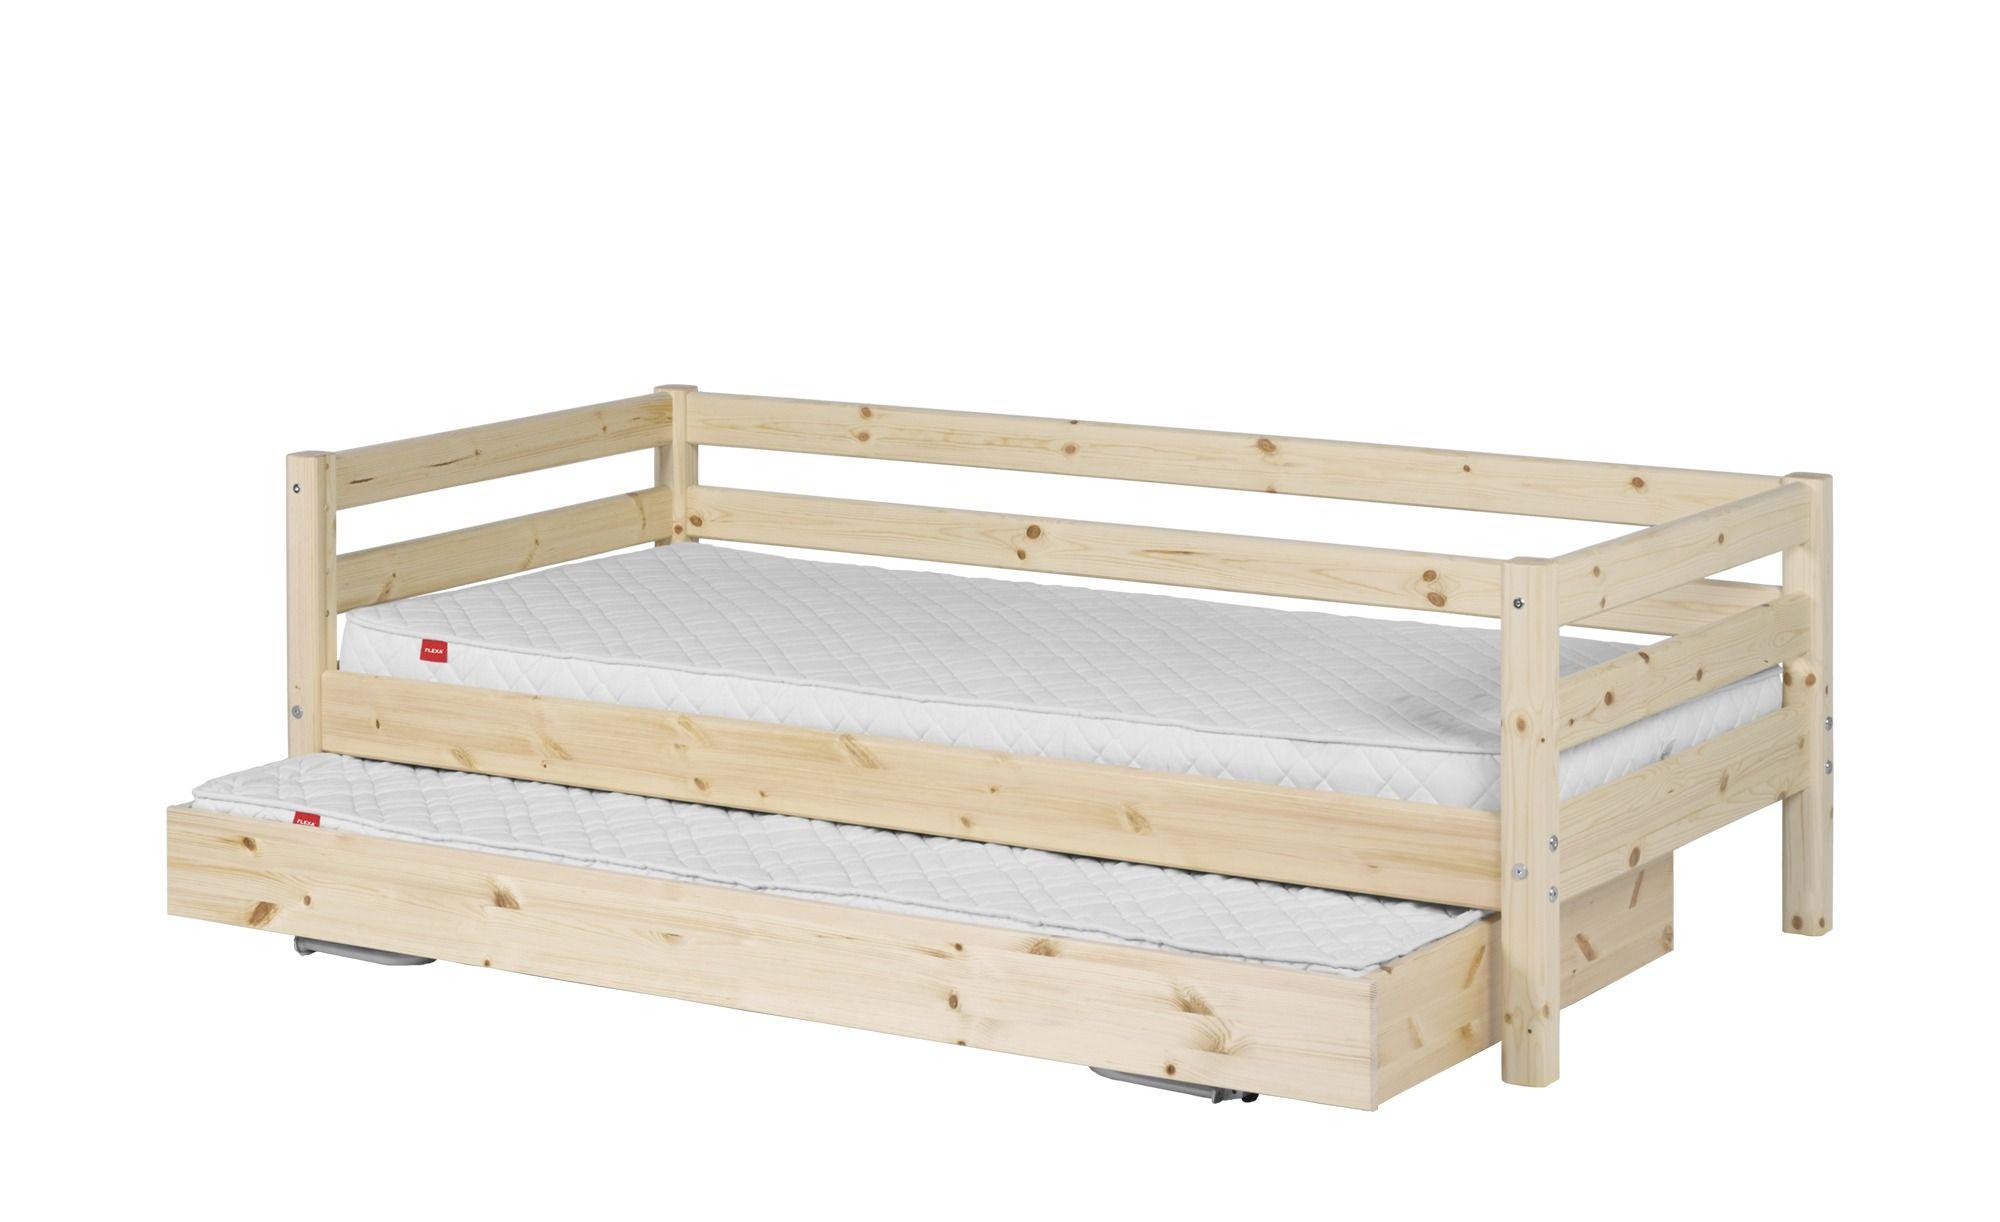 Flexa Bett Mit Ausziehbett 90x190 Kiefer Flexa Classic Betten